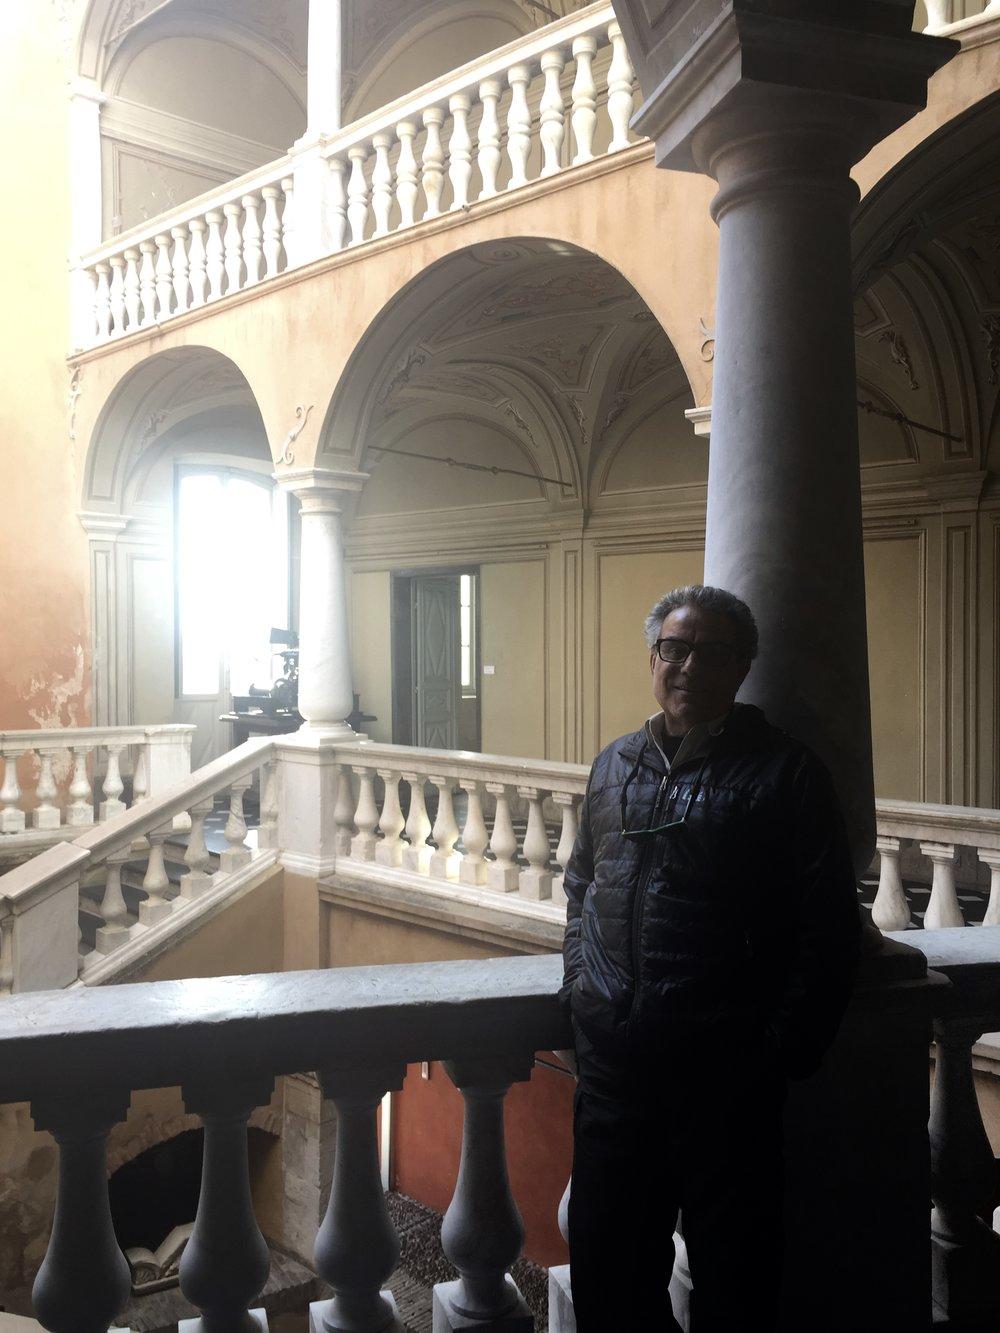 Inside the castle